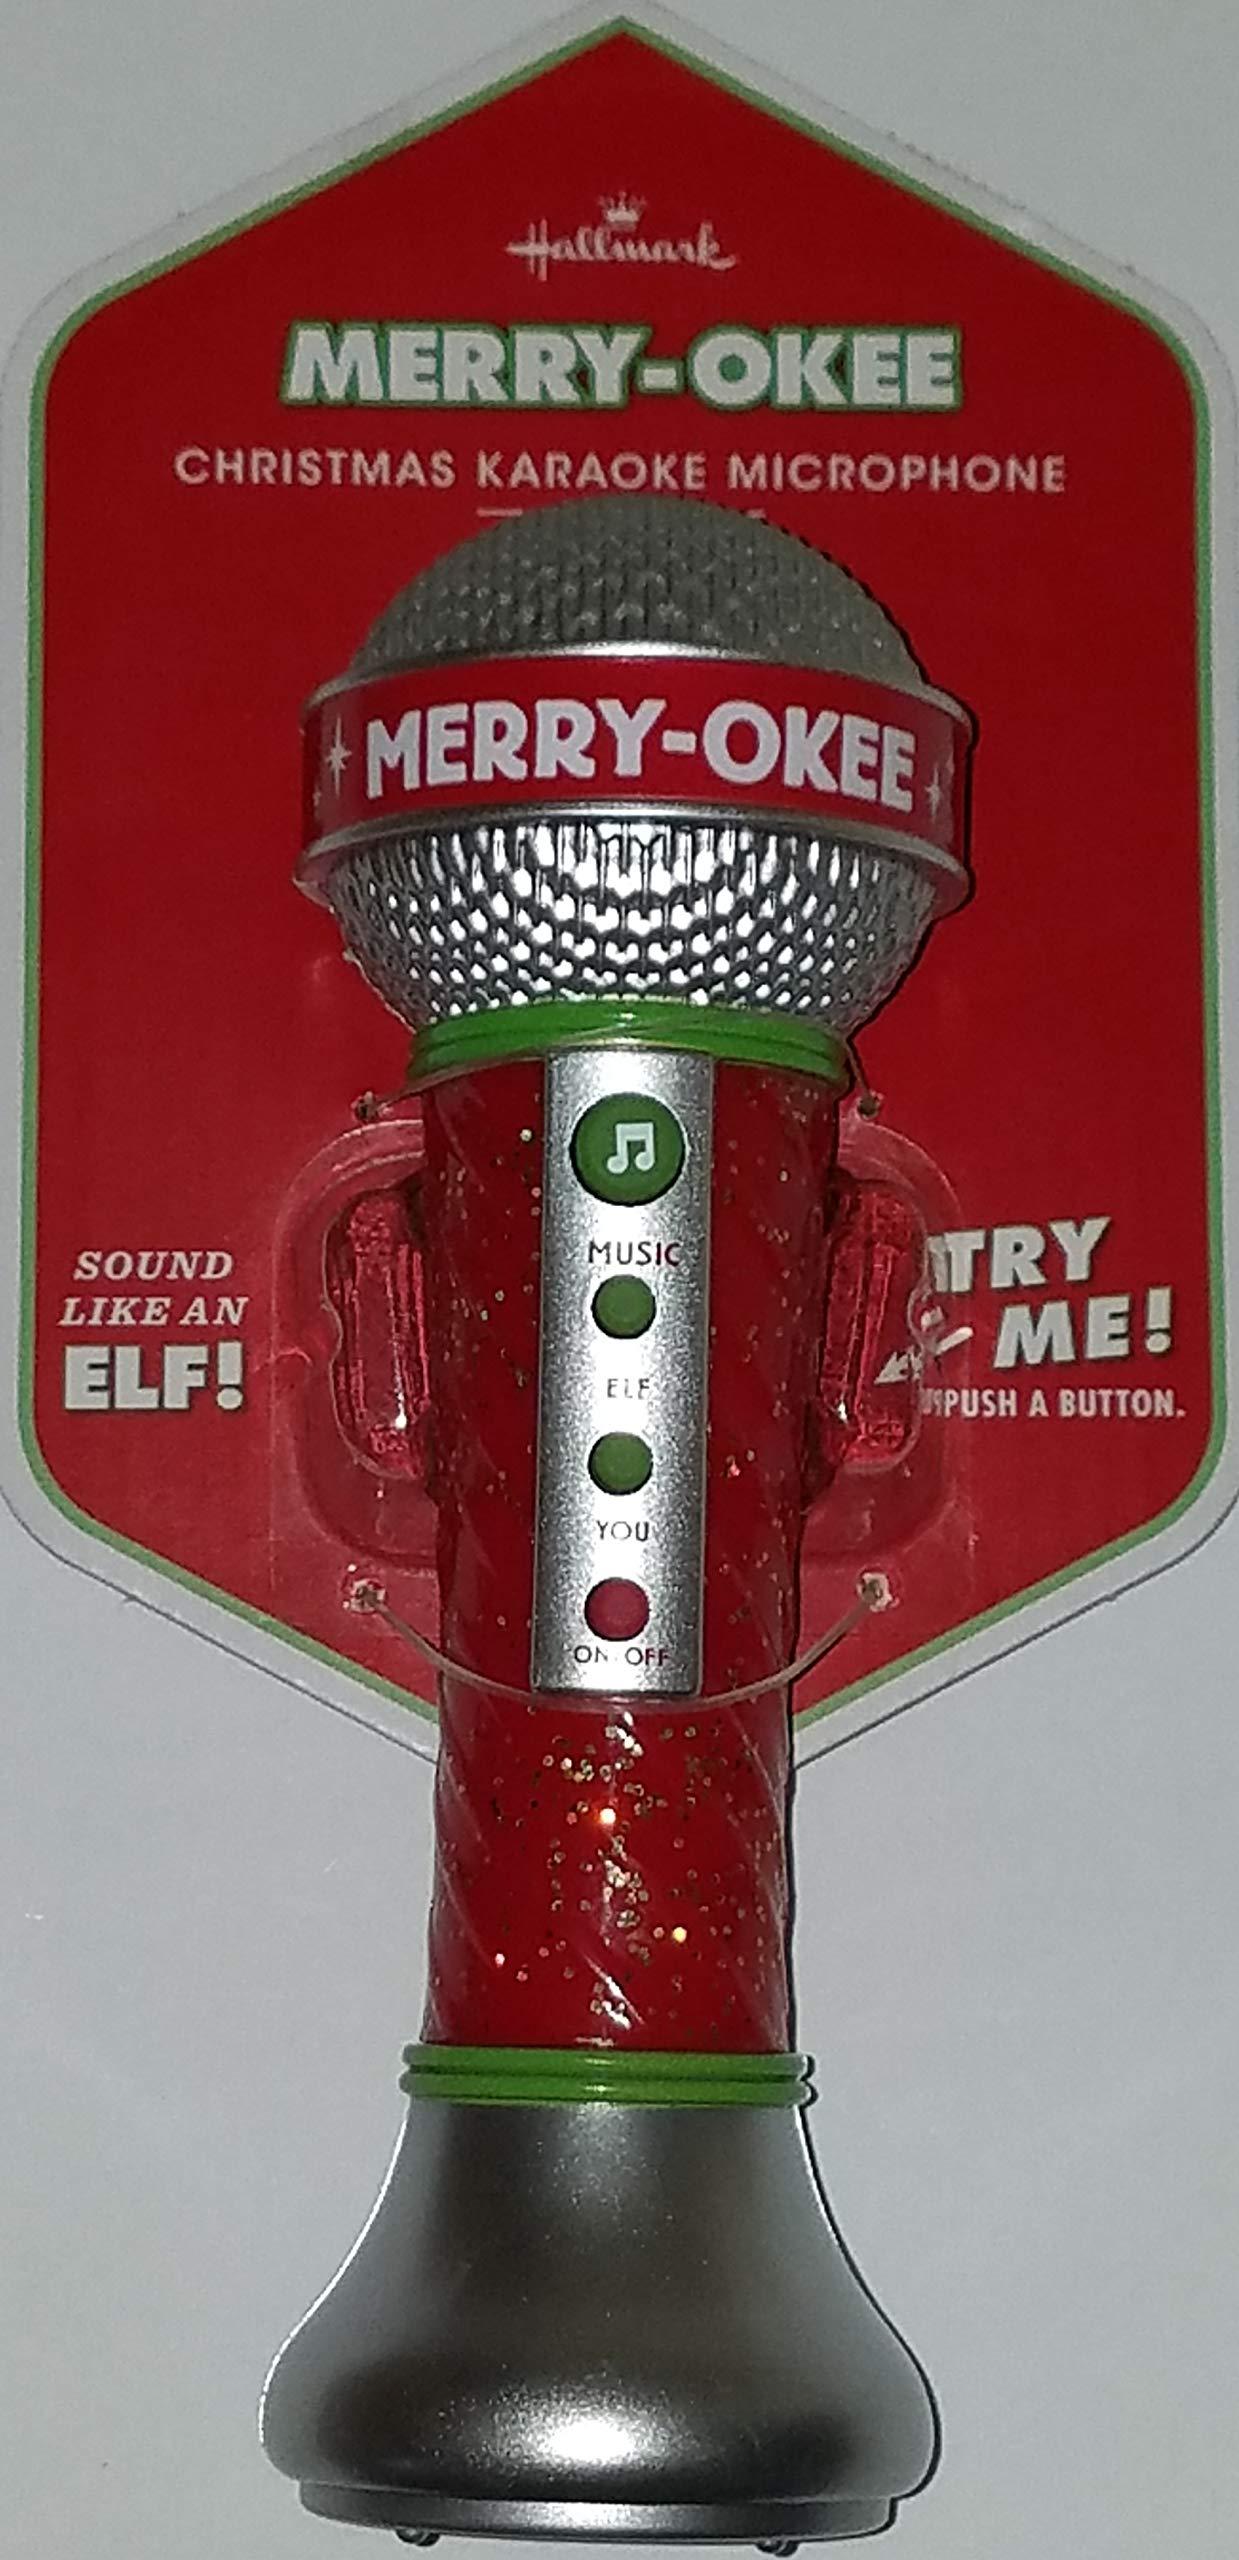 Christmas Karaoke Microphone